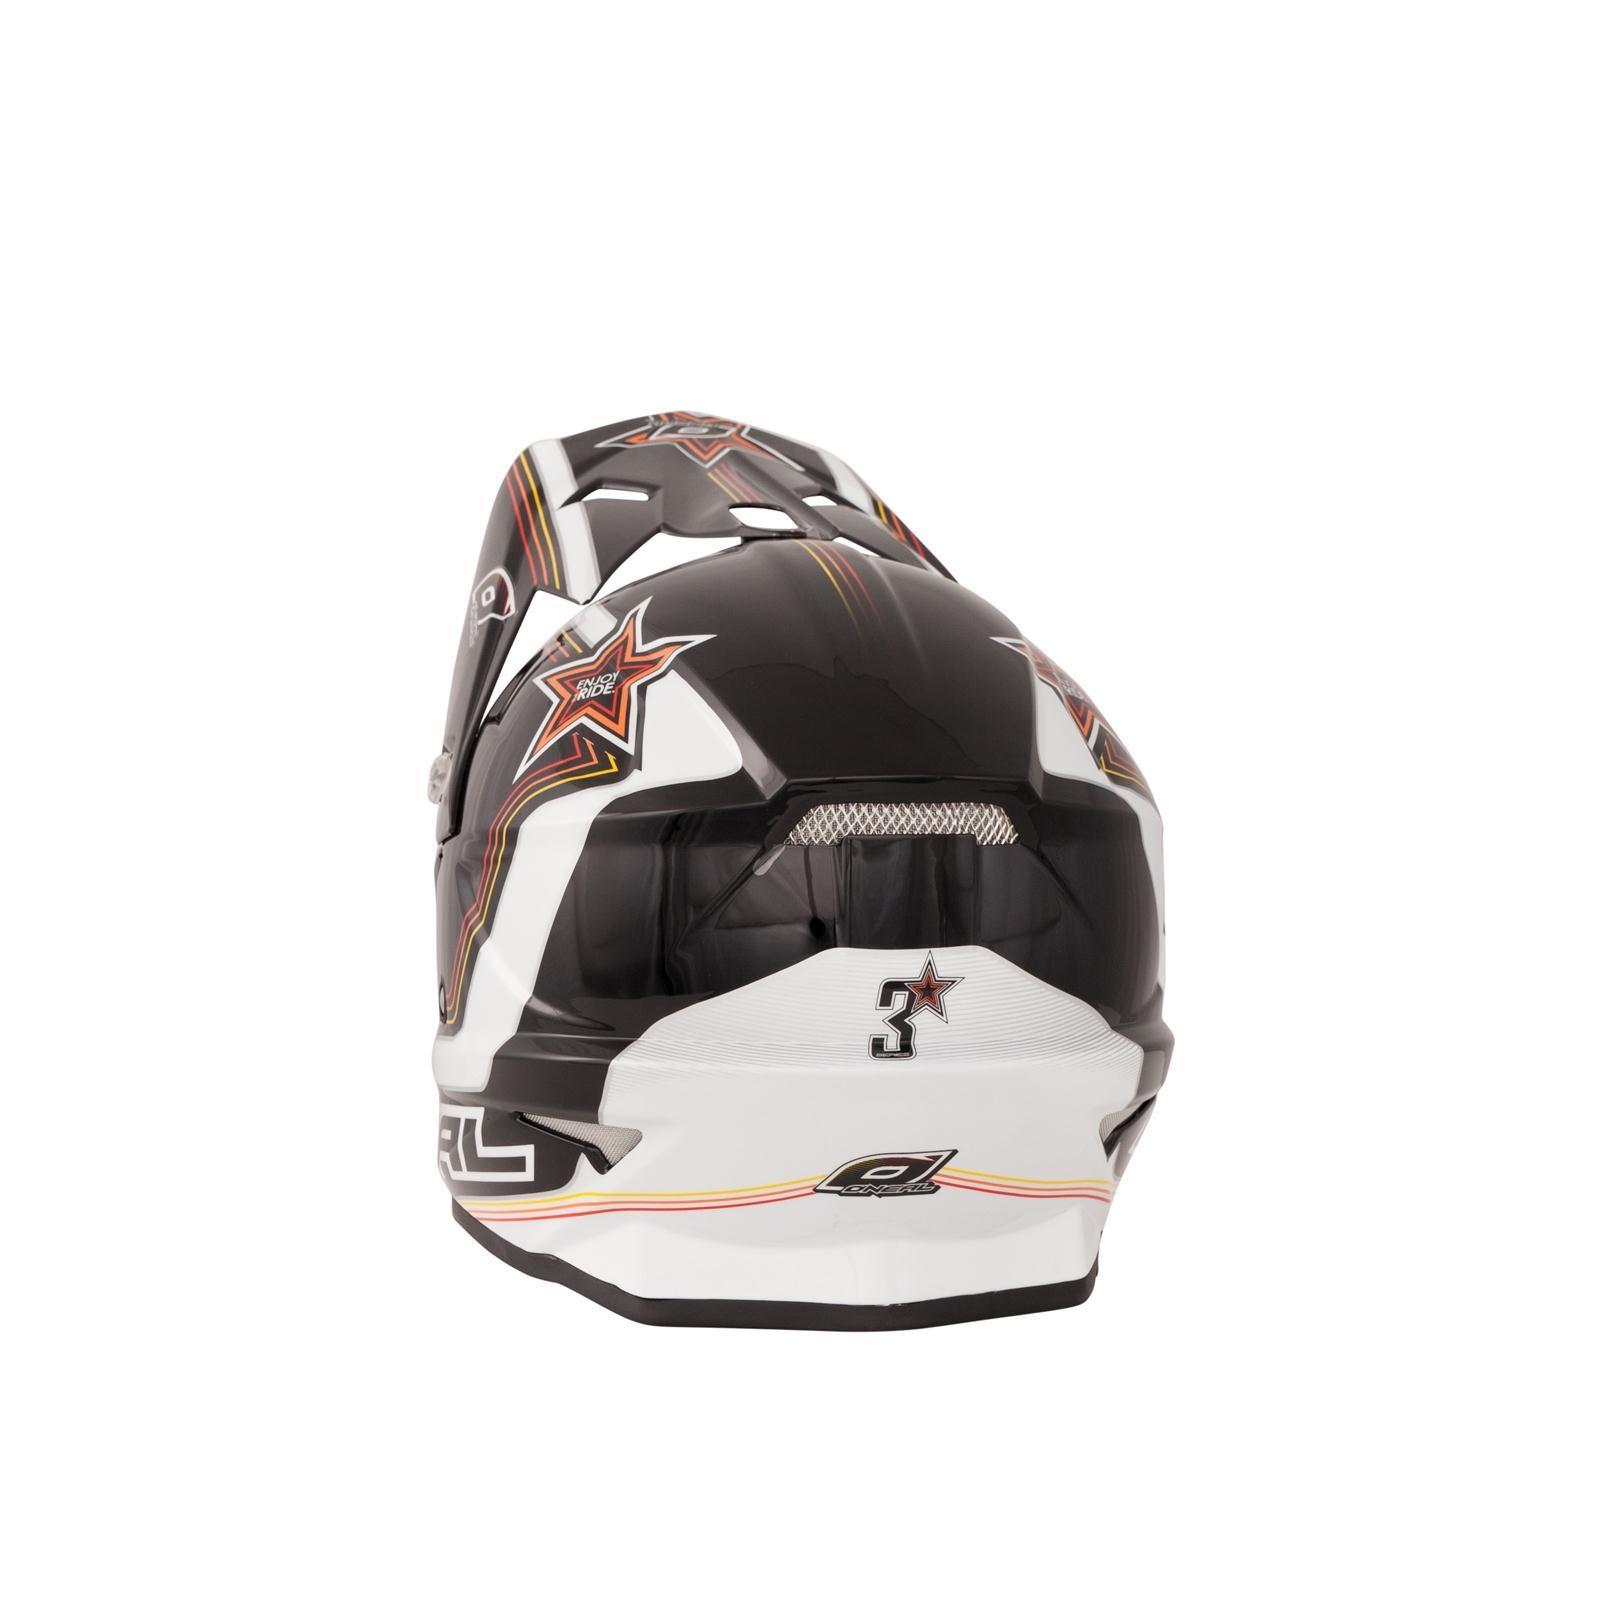 ONeal-Motocross-casco-MX-ENDURO-MOTO-BICI-FUORISTRADA-CROSS-Series-Adventure miniatura 123